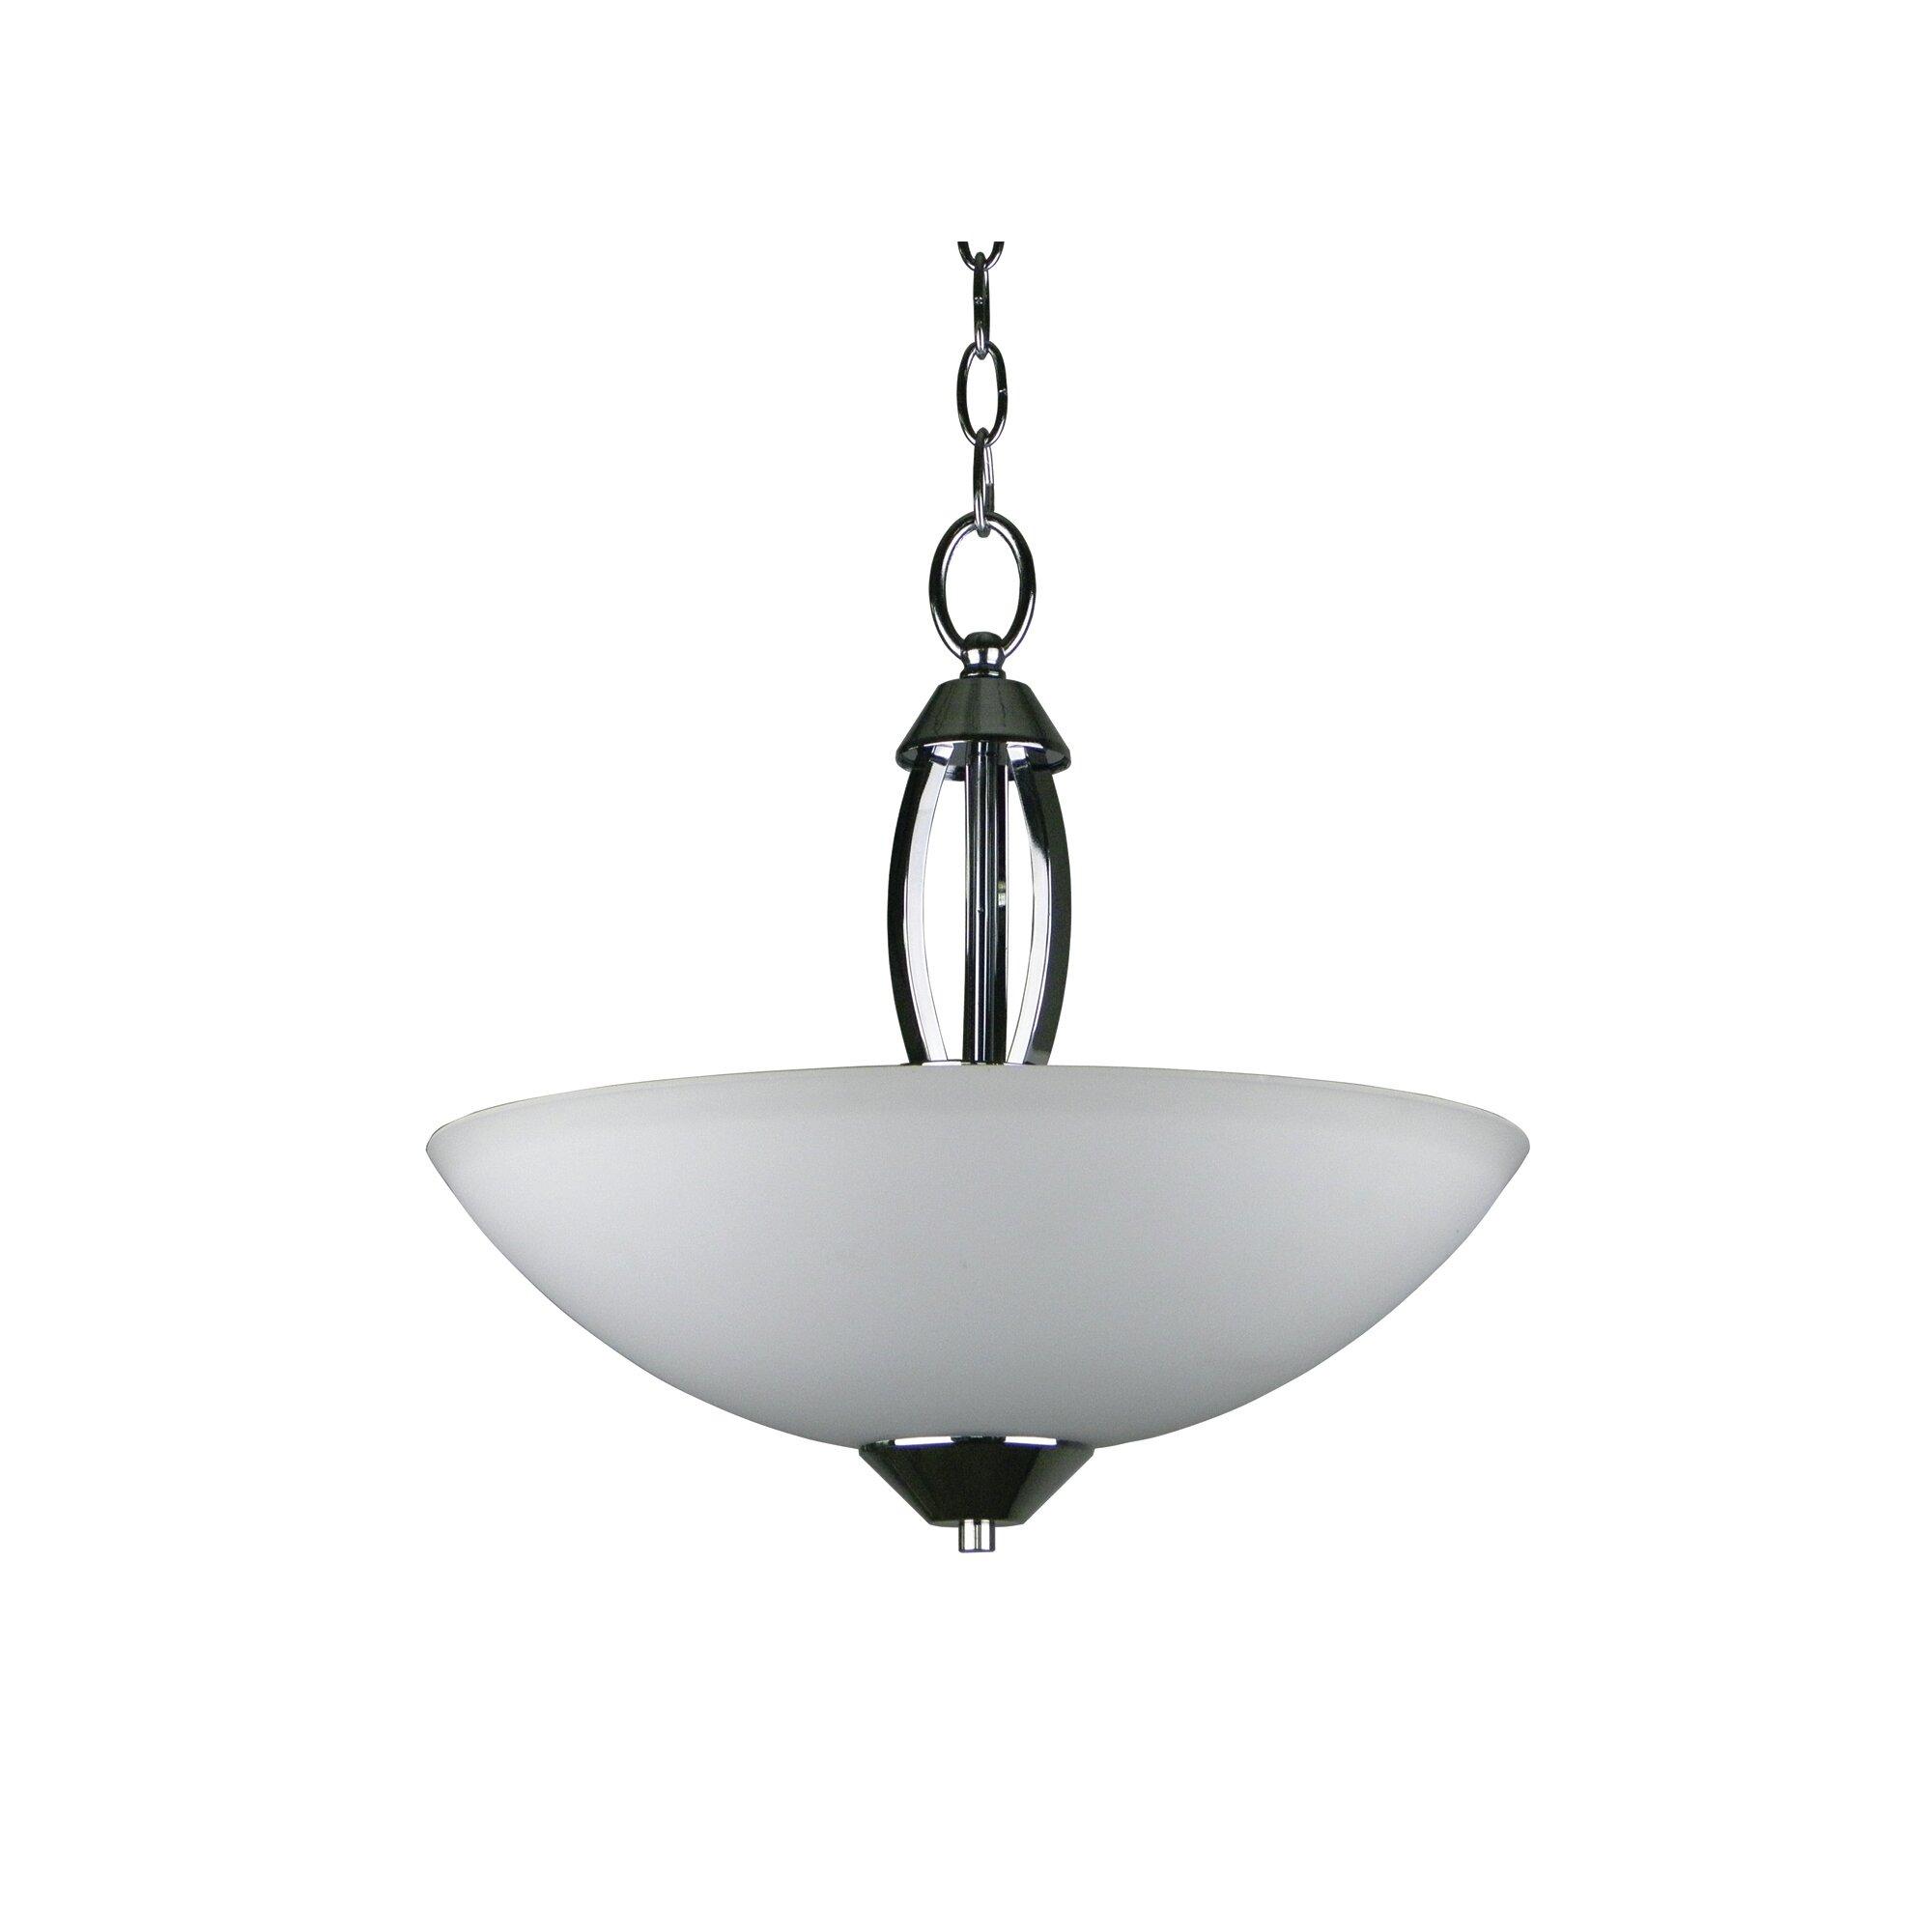 paloma 3 light inverted bowl pendant by yosemite home decor. Black Bedroom Furniture Sets. Home Design Ideas